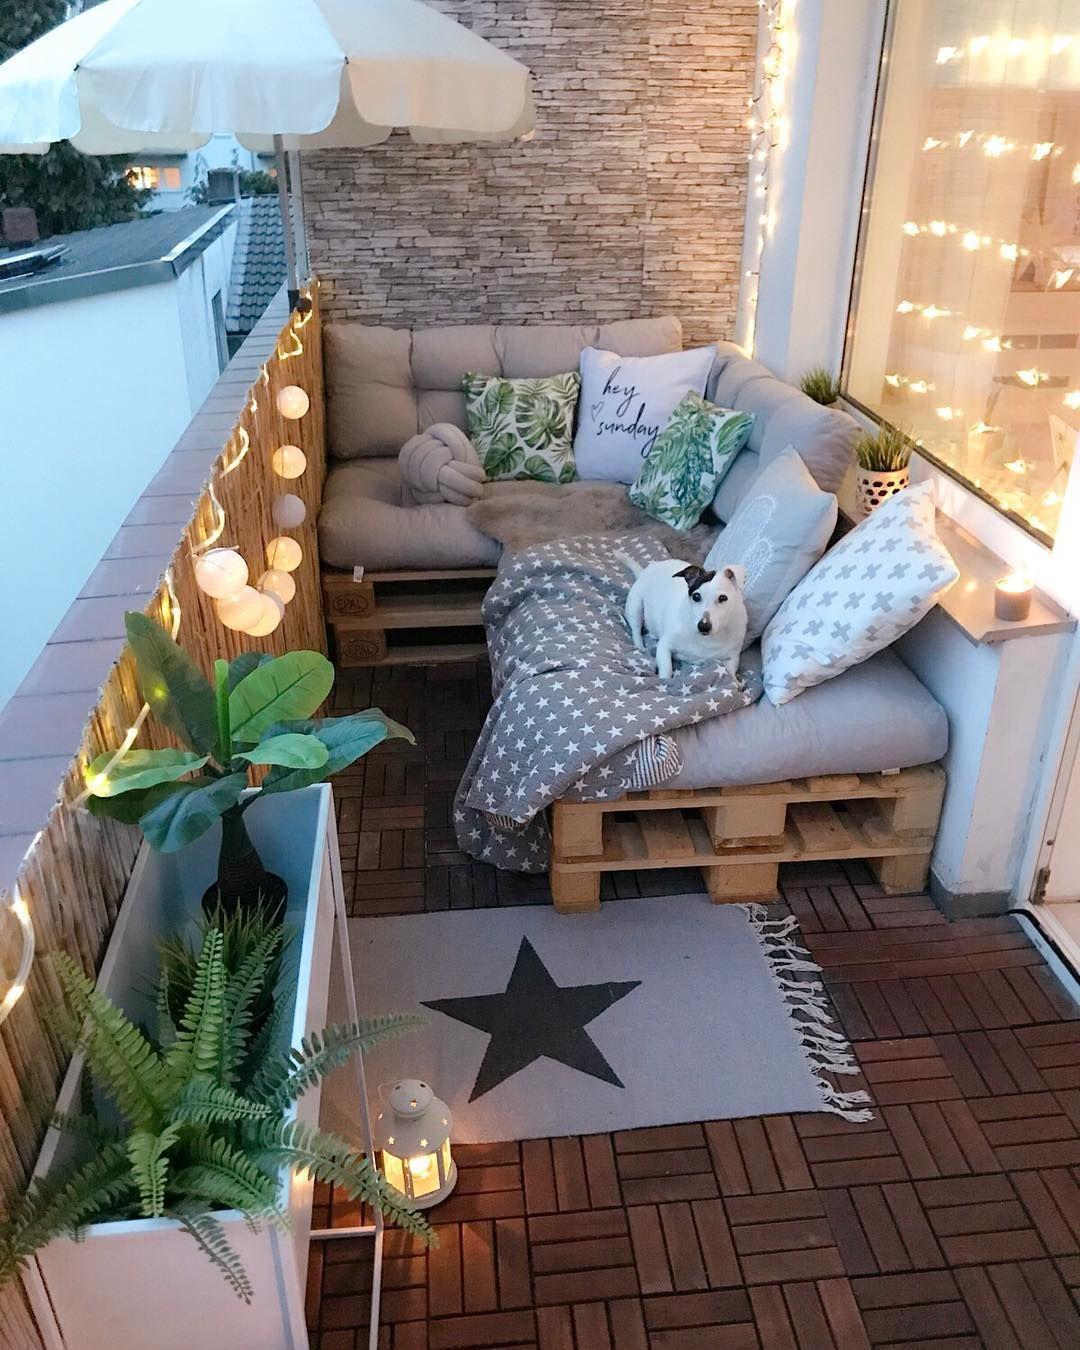 15 Beautiful Ways To Decorate A Balcony And Make It Feel Li